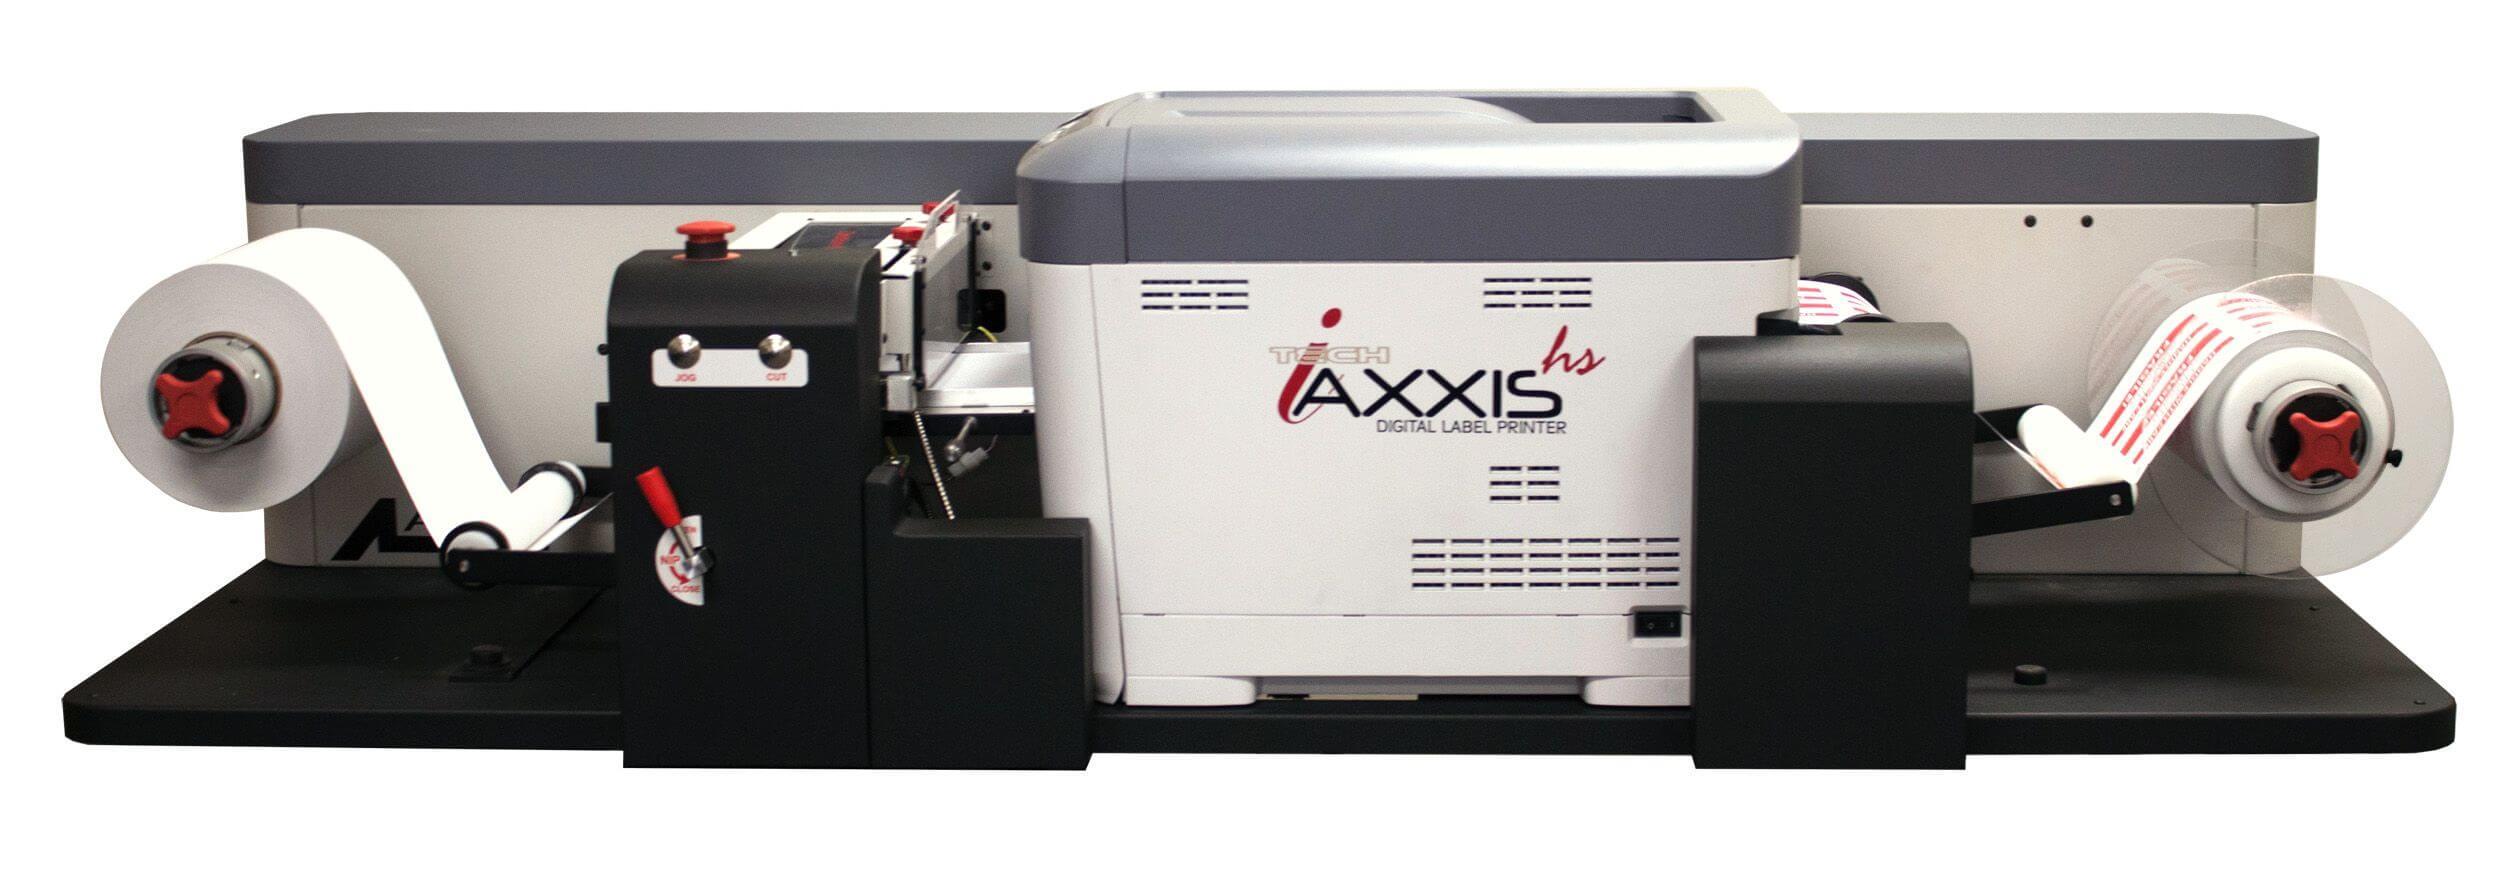 NTG-Axxis-Printer